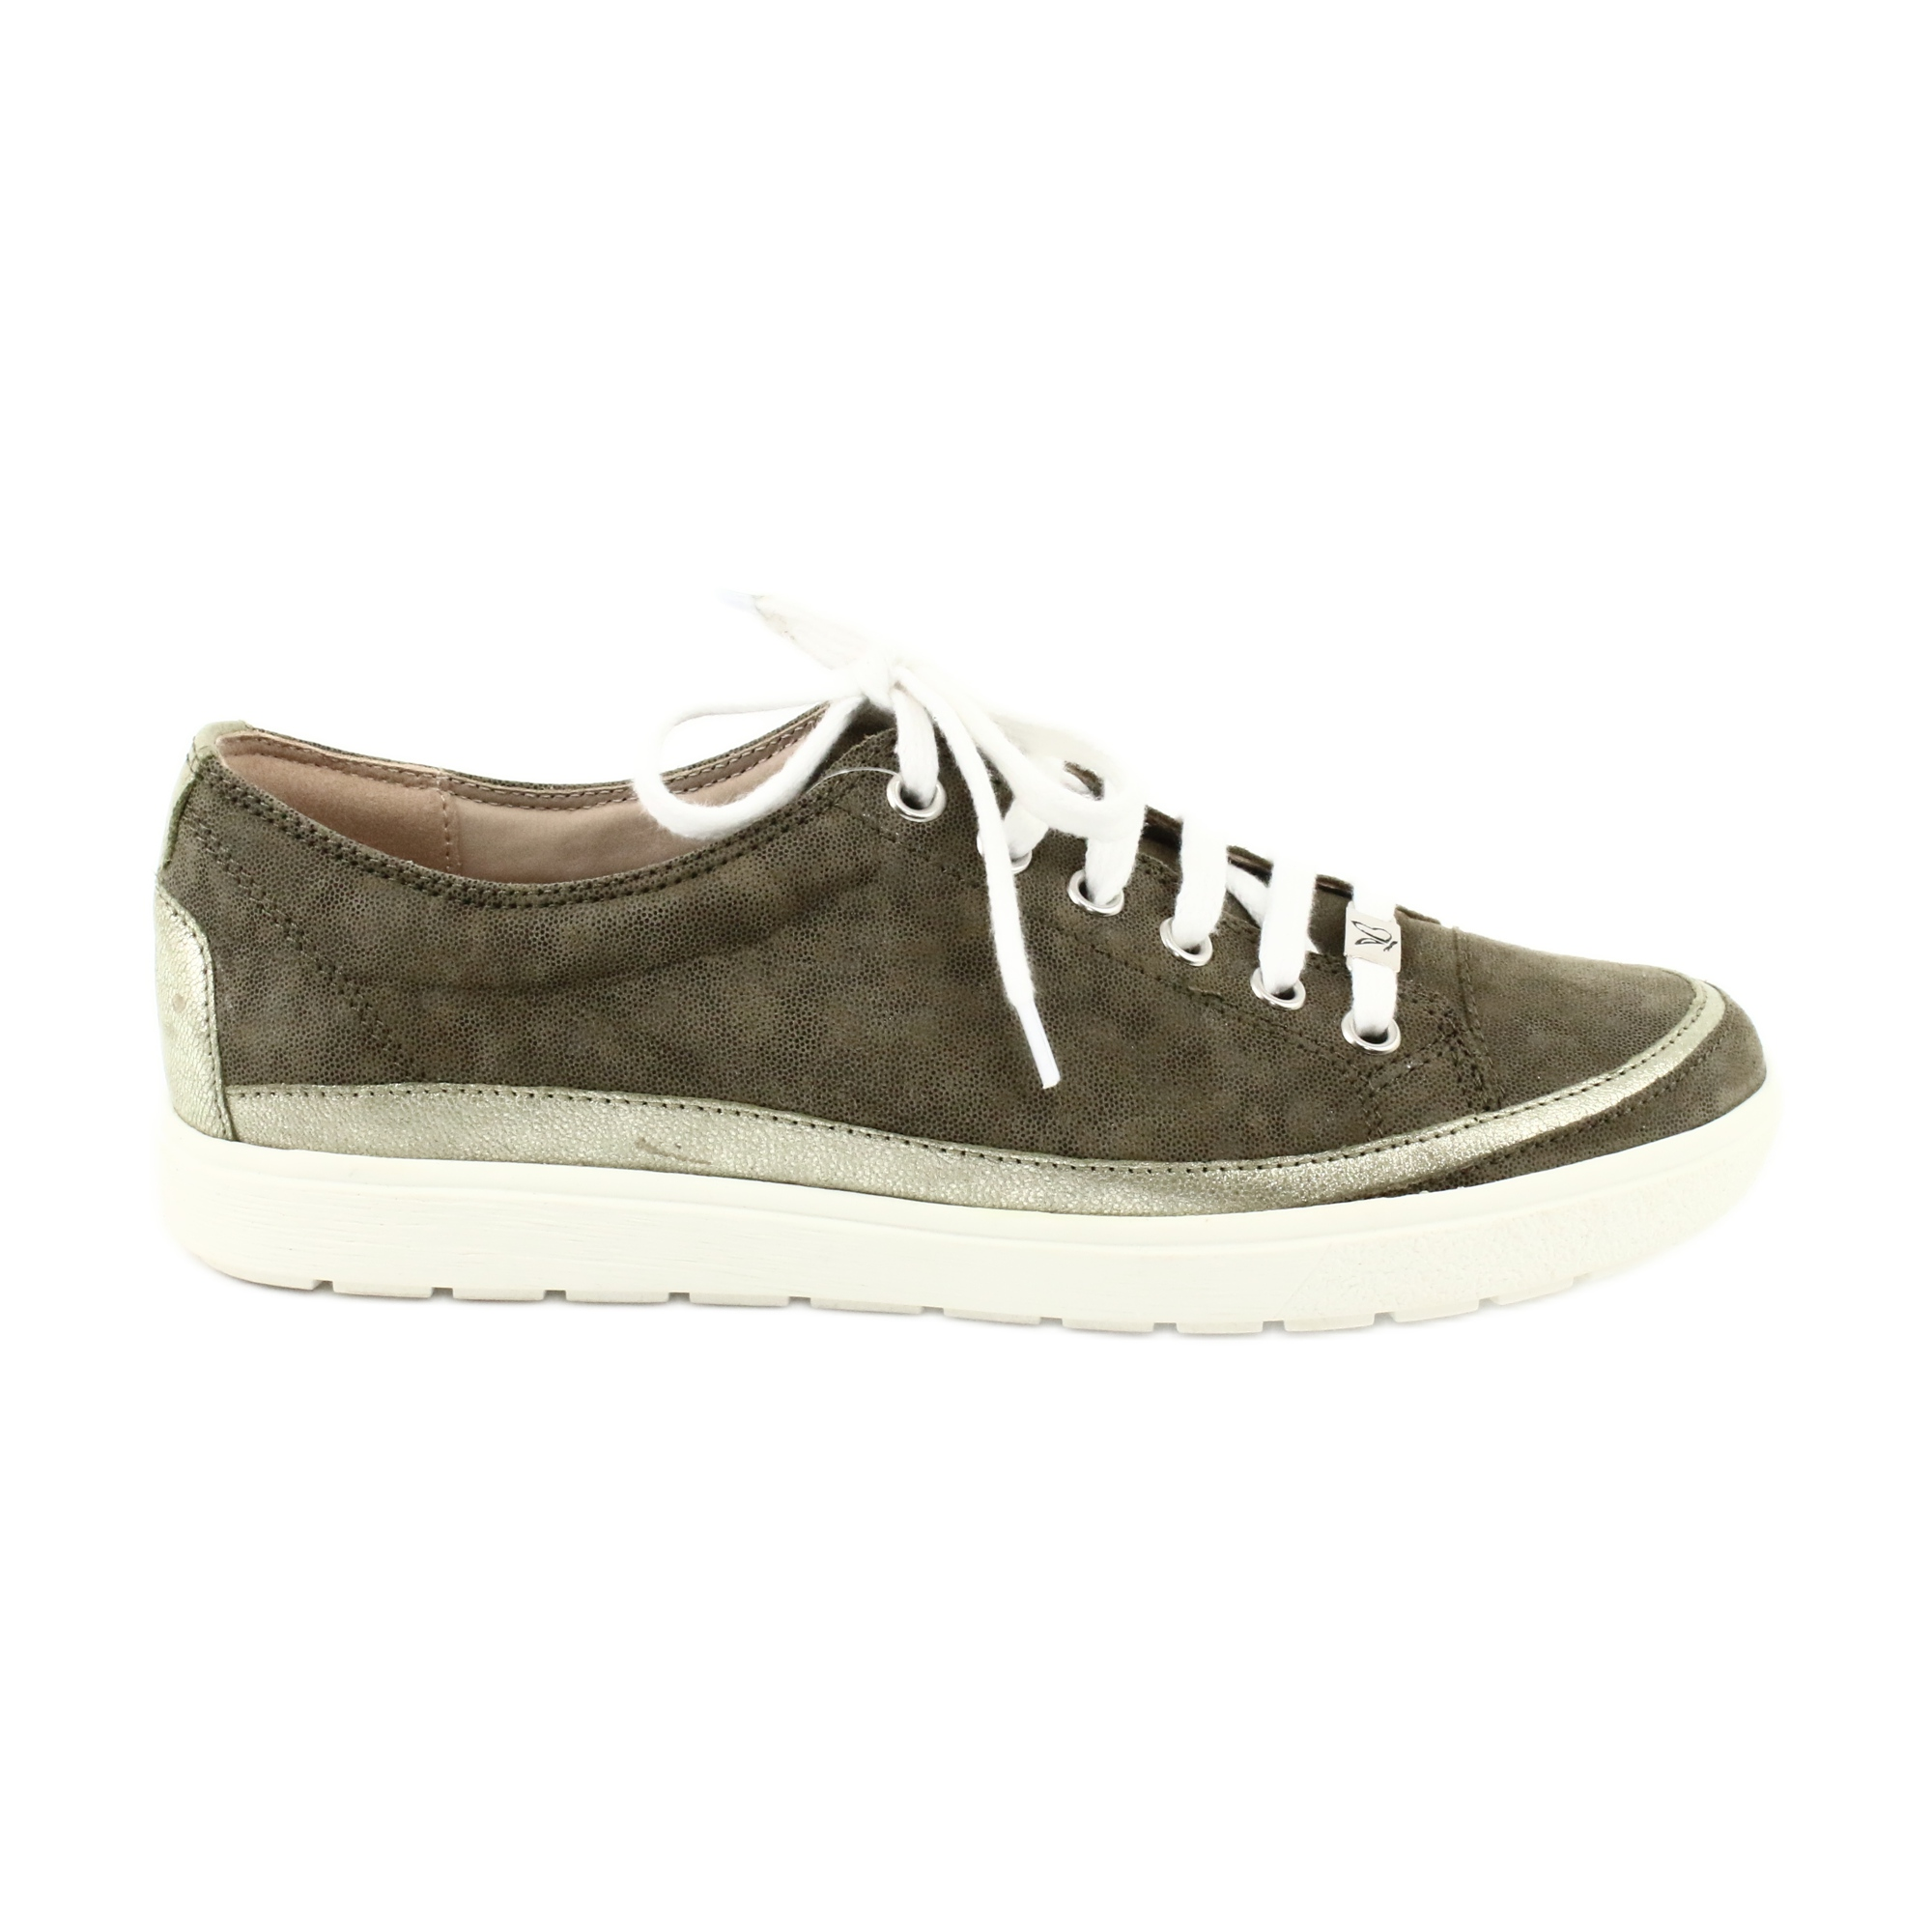 buy online 9e055 bb555 Grün Caprice Damenschuhe Leder Sneakers 23654